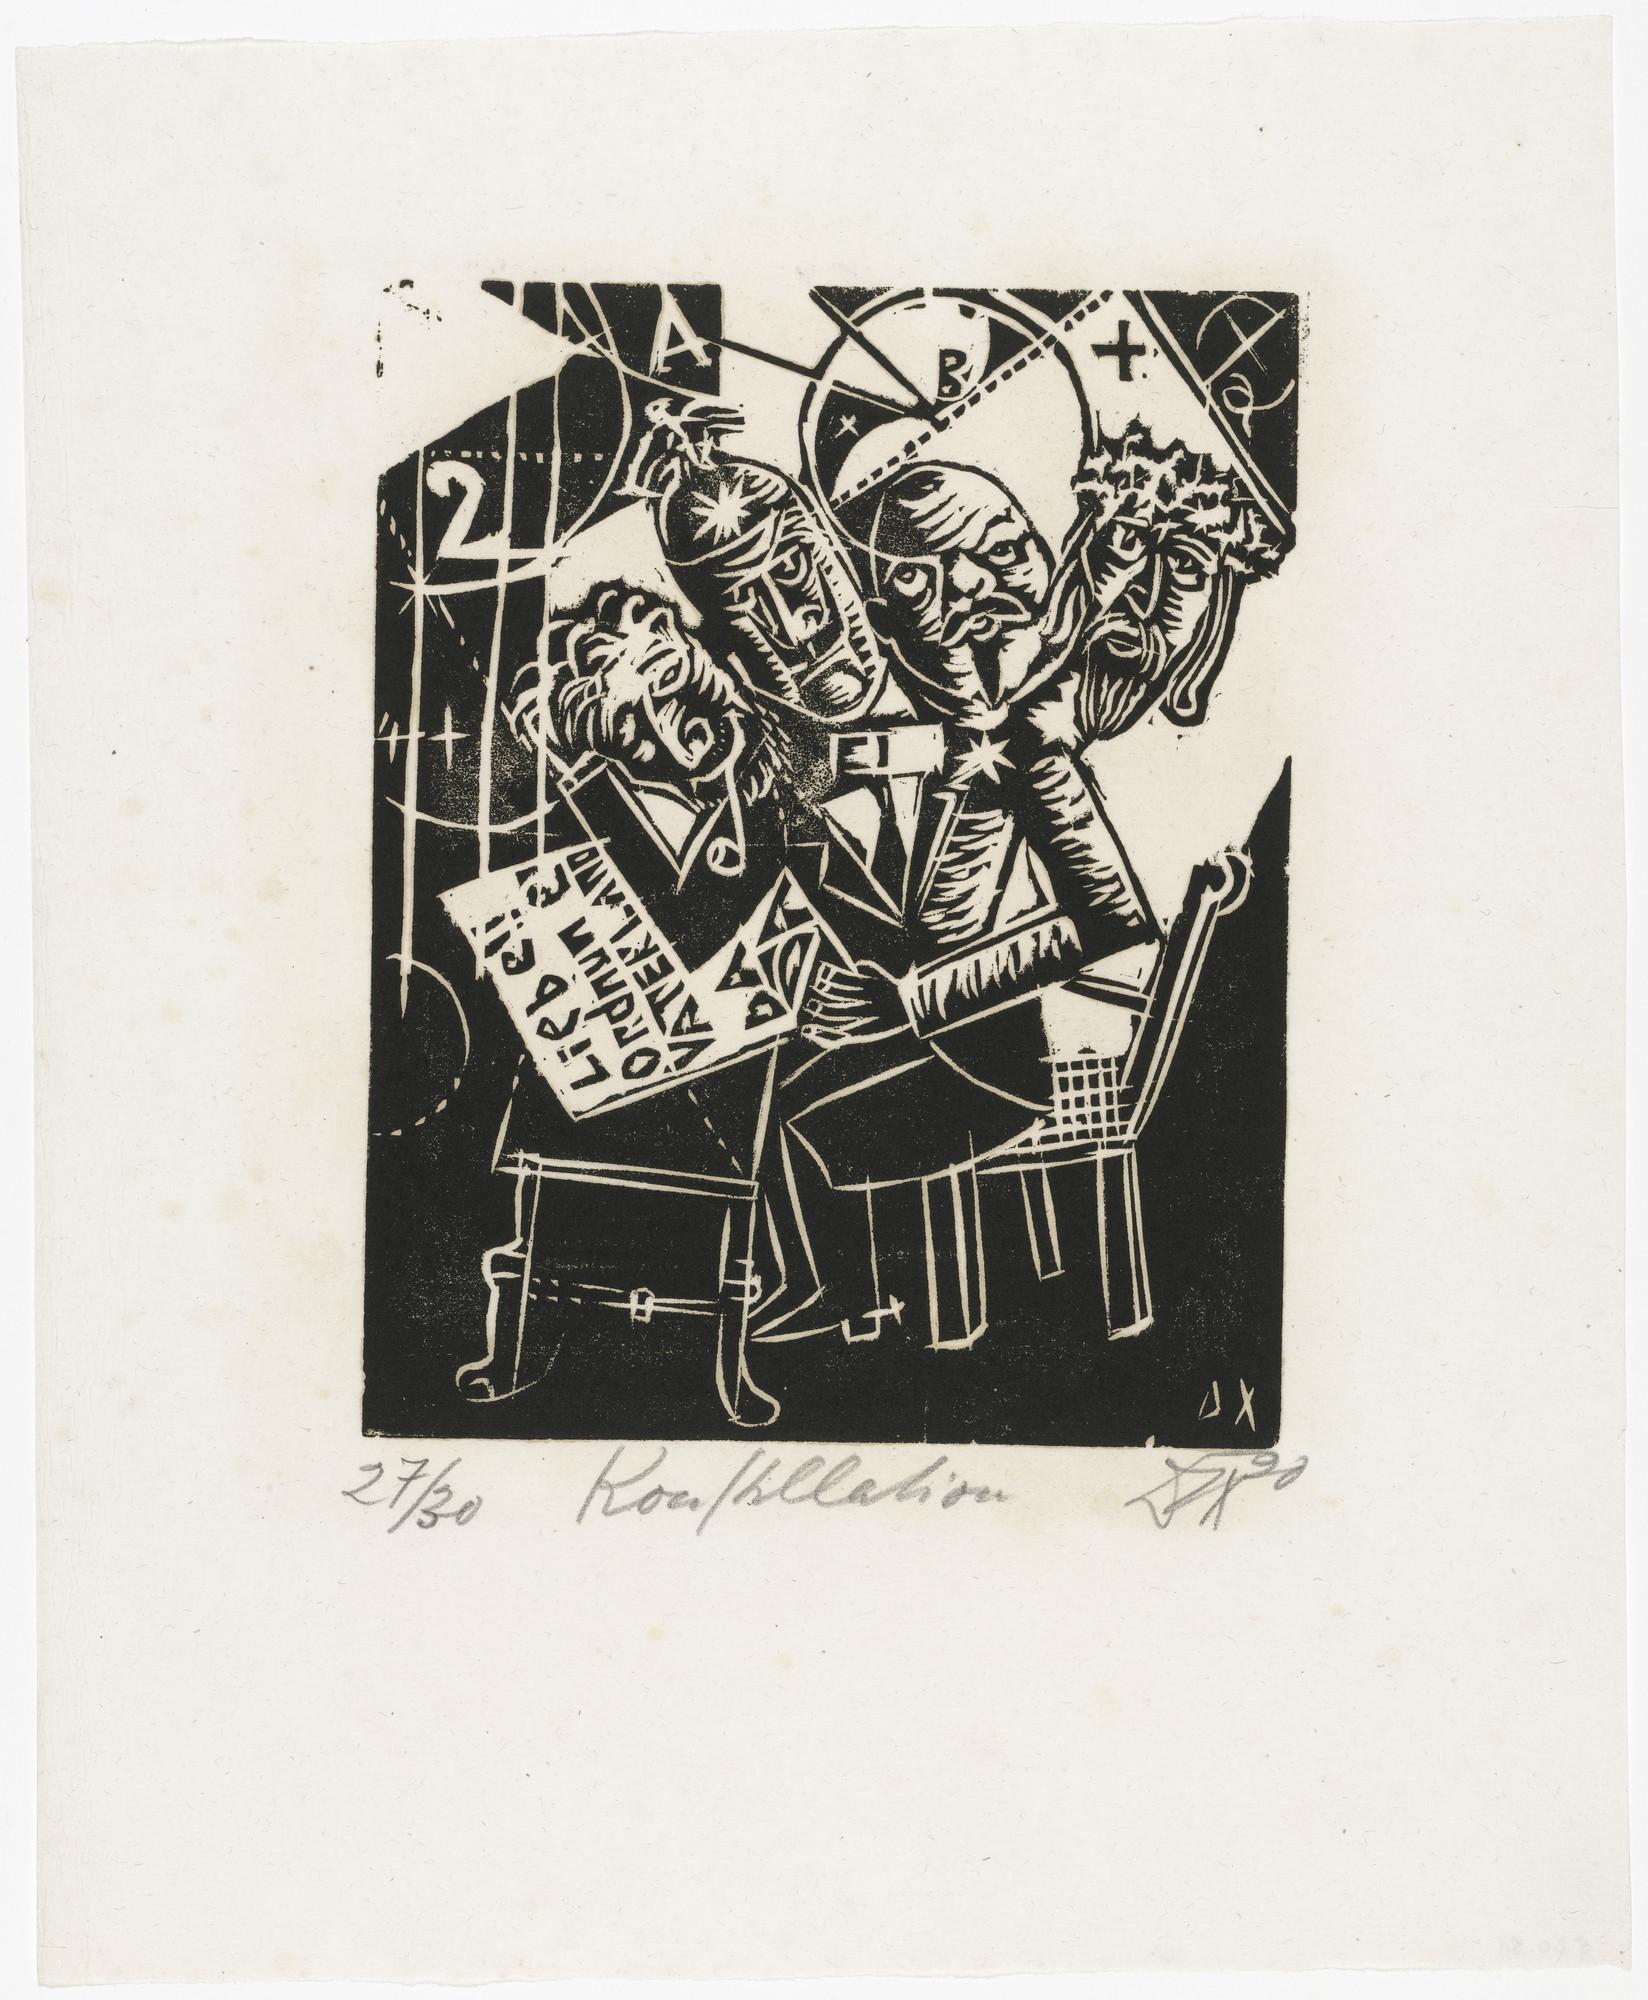 Otto Dix. The Celebrities (Constellation) [Die Prominenten (Konstellation)] from the portfolio Nine Woodcuts (Neun Holzschnitte). 1920 (published 1922)